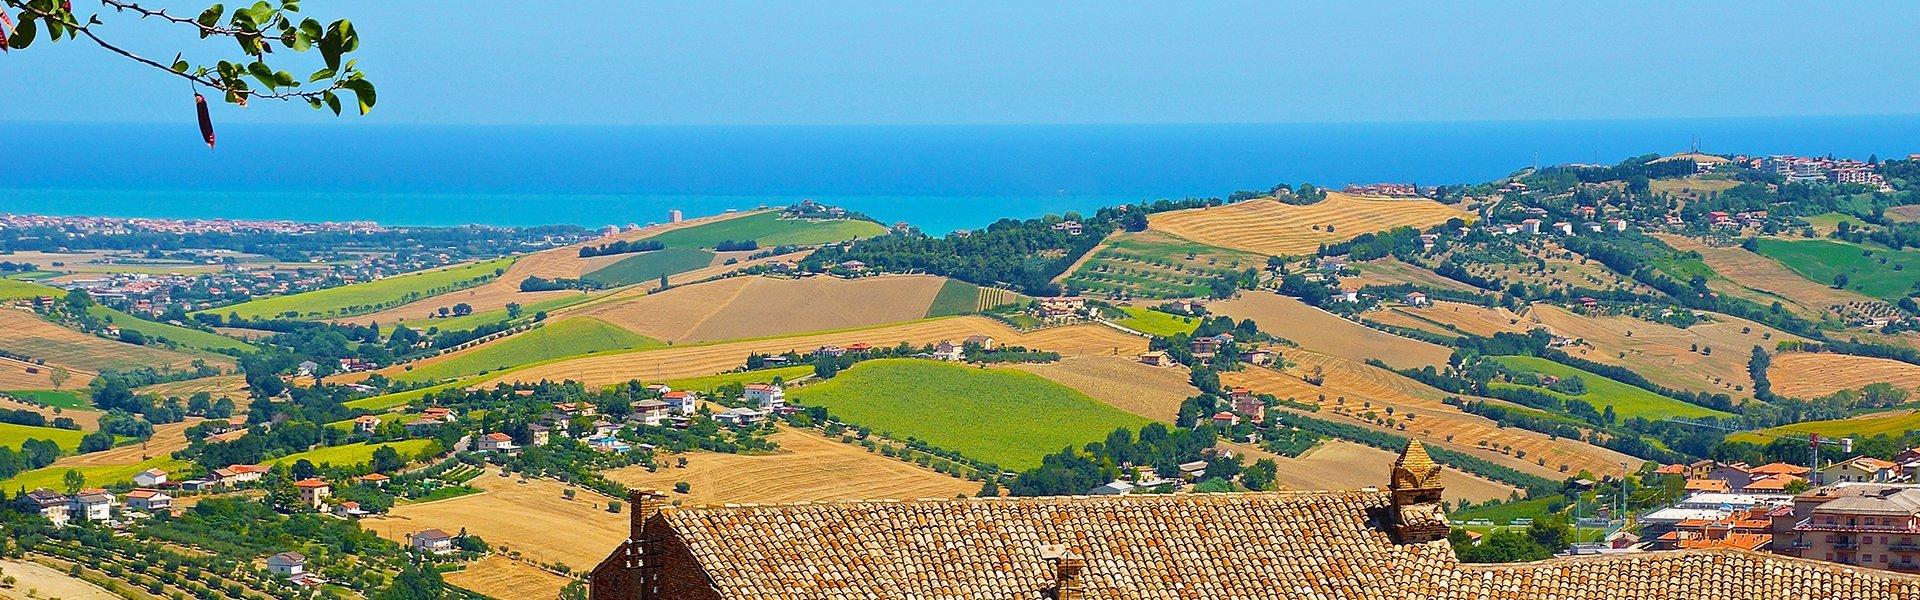 De Marken, Italië